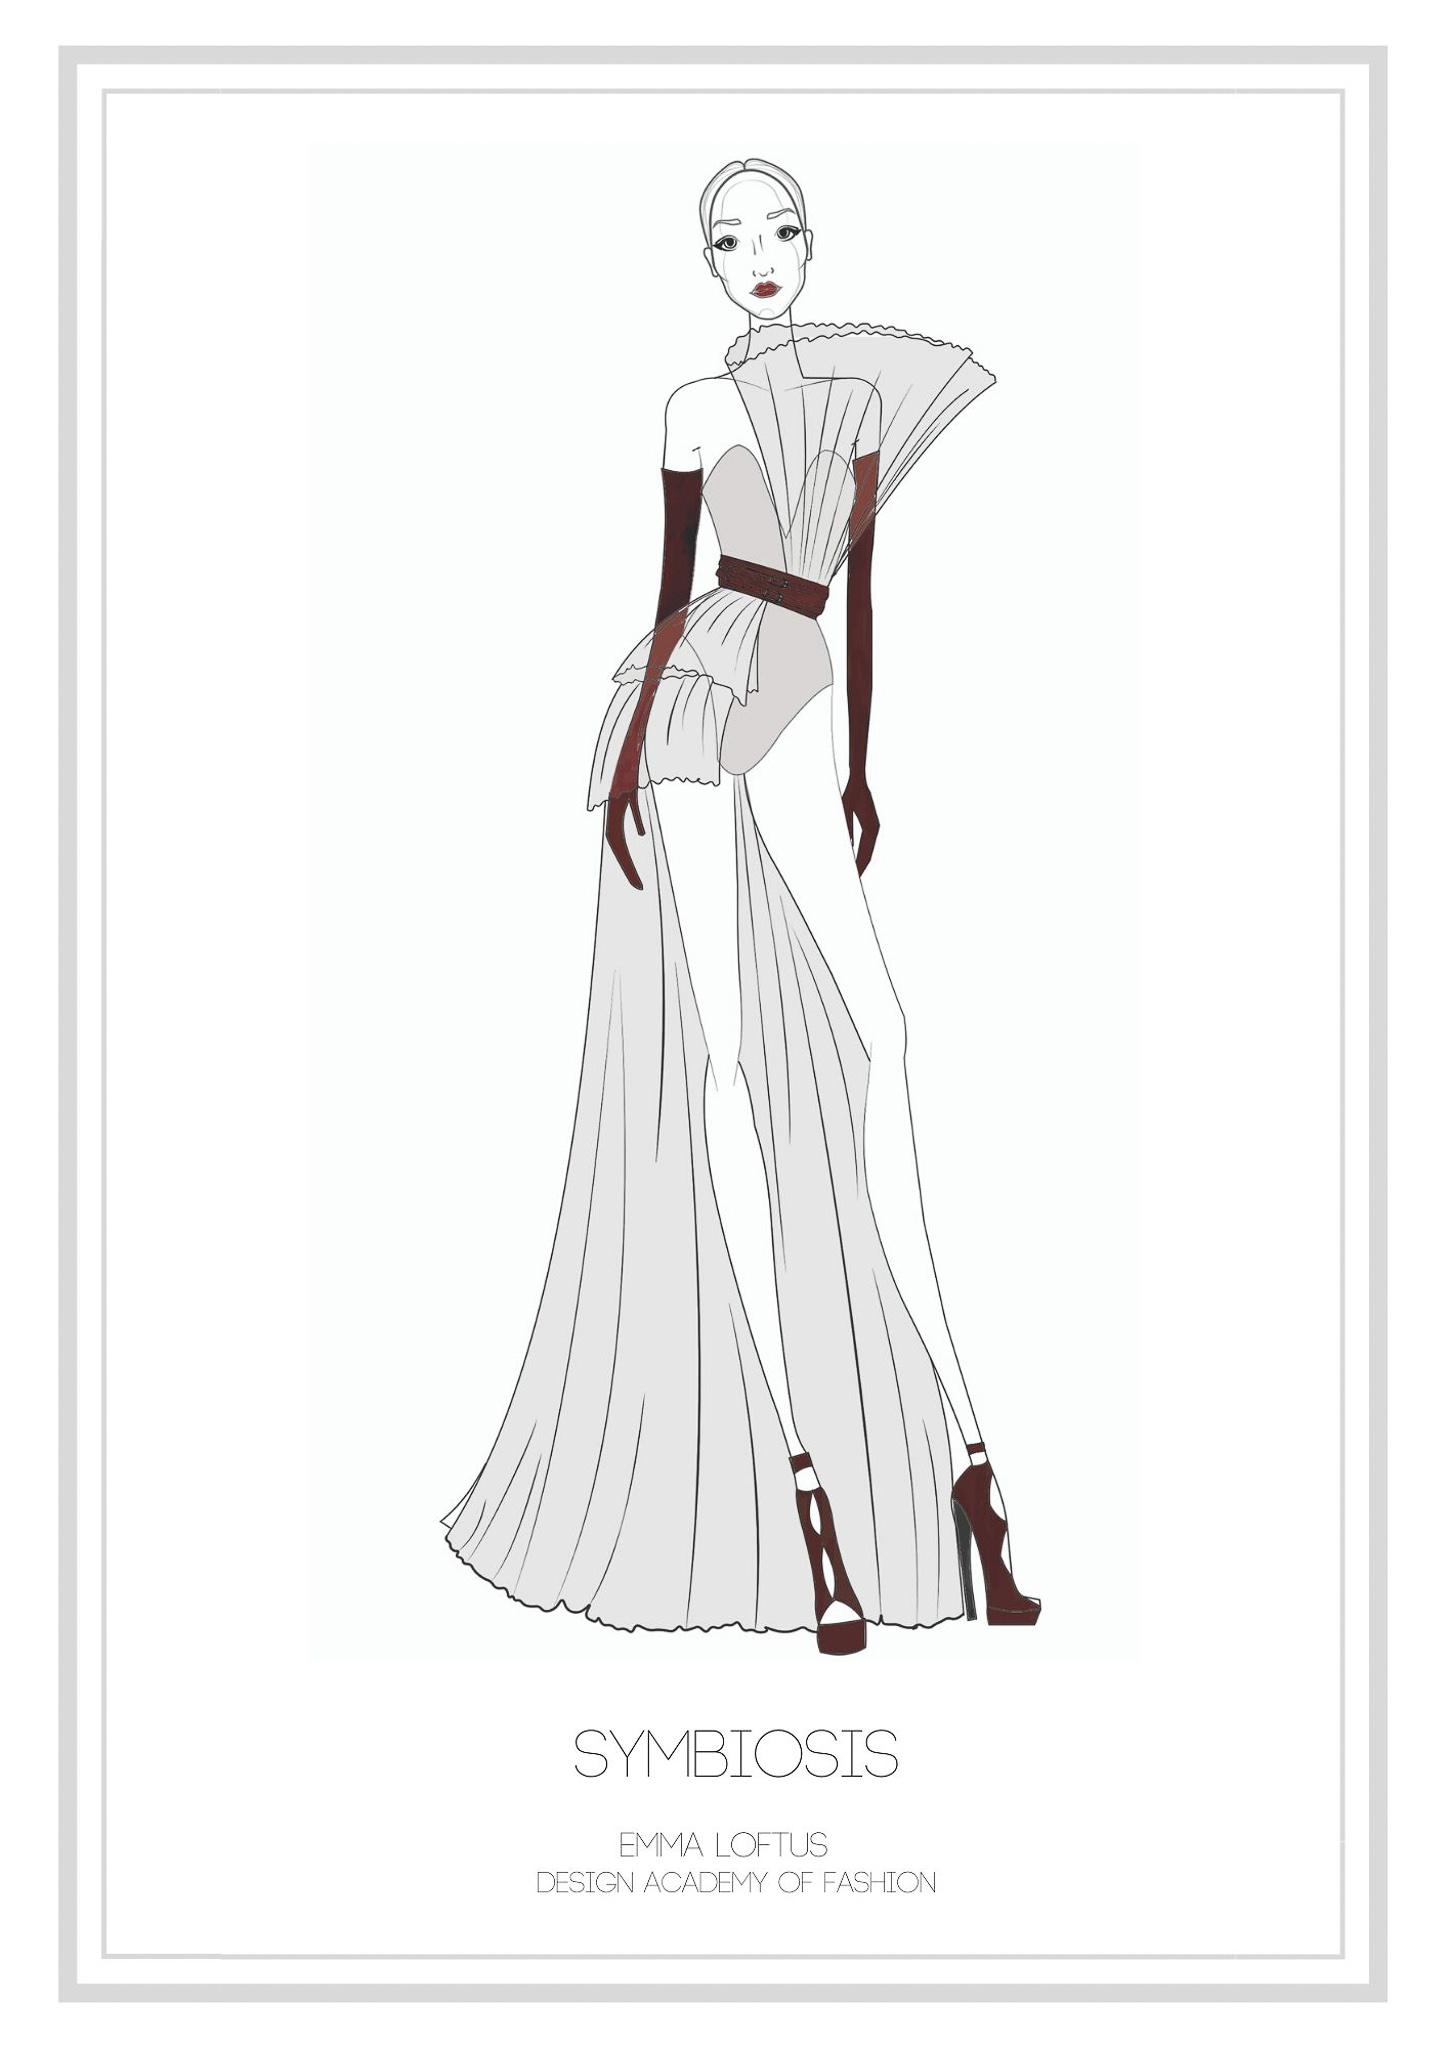 075 2 Frankfurt Style Award En